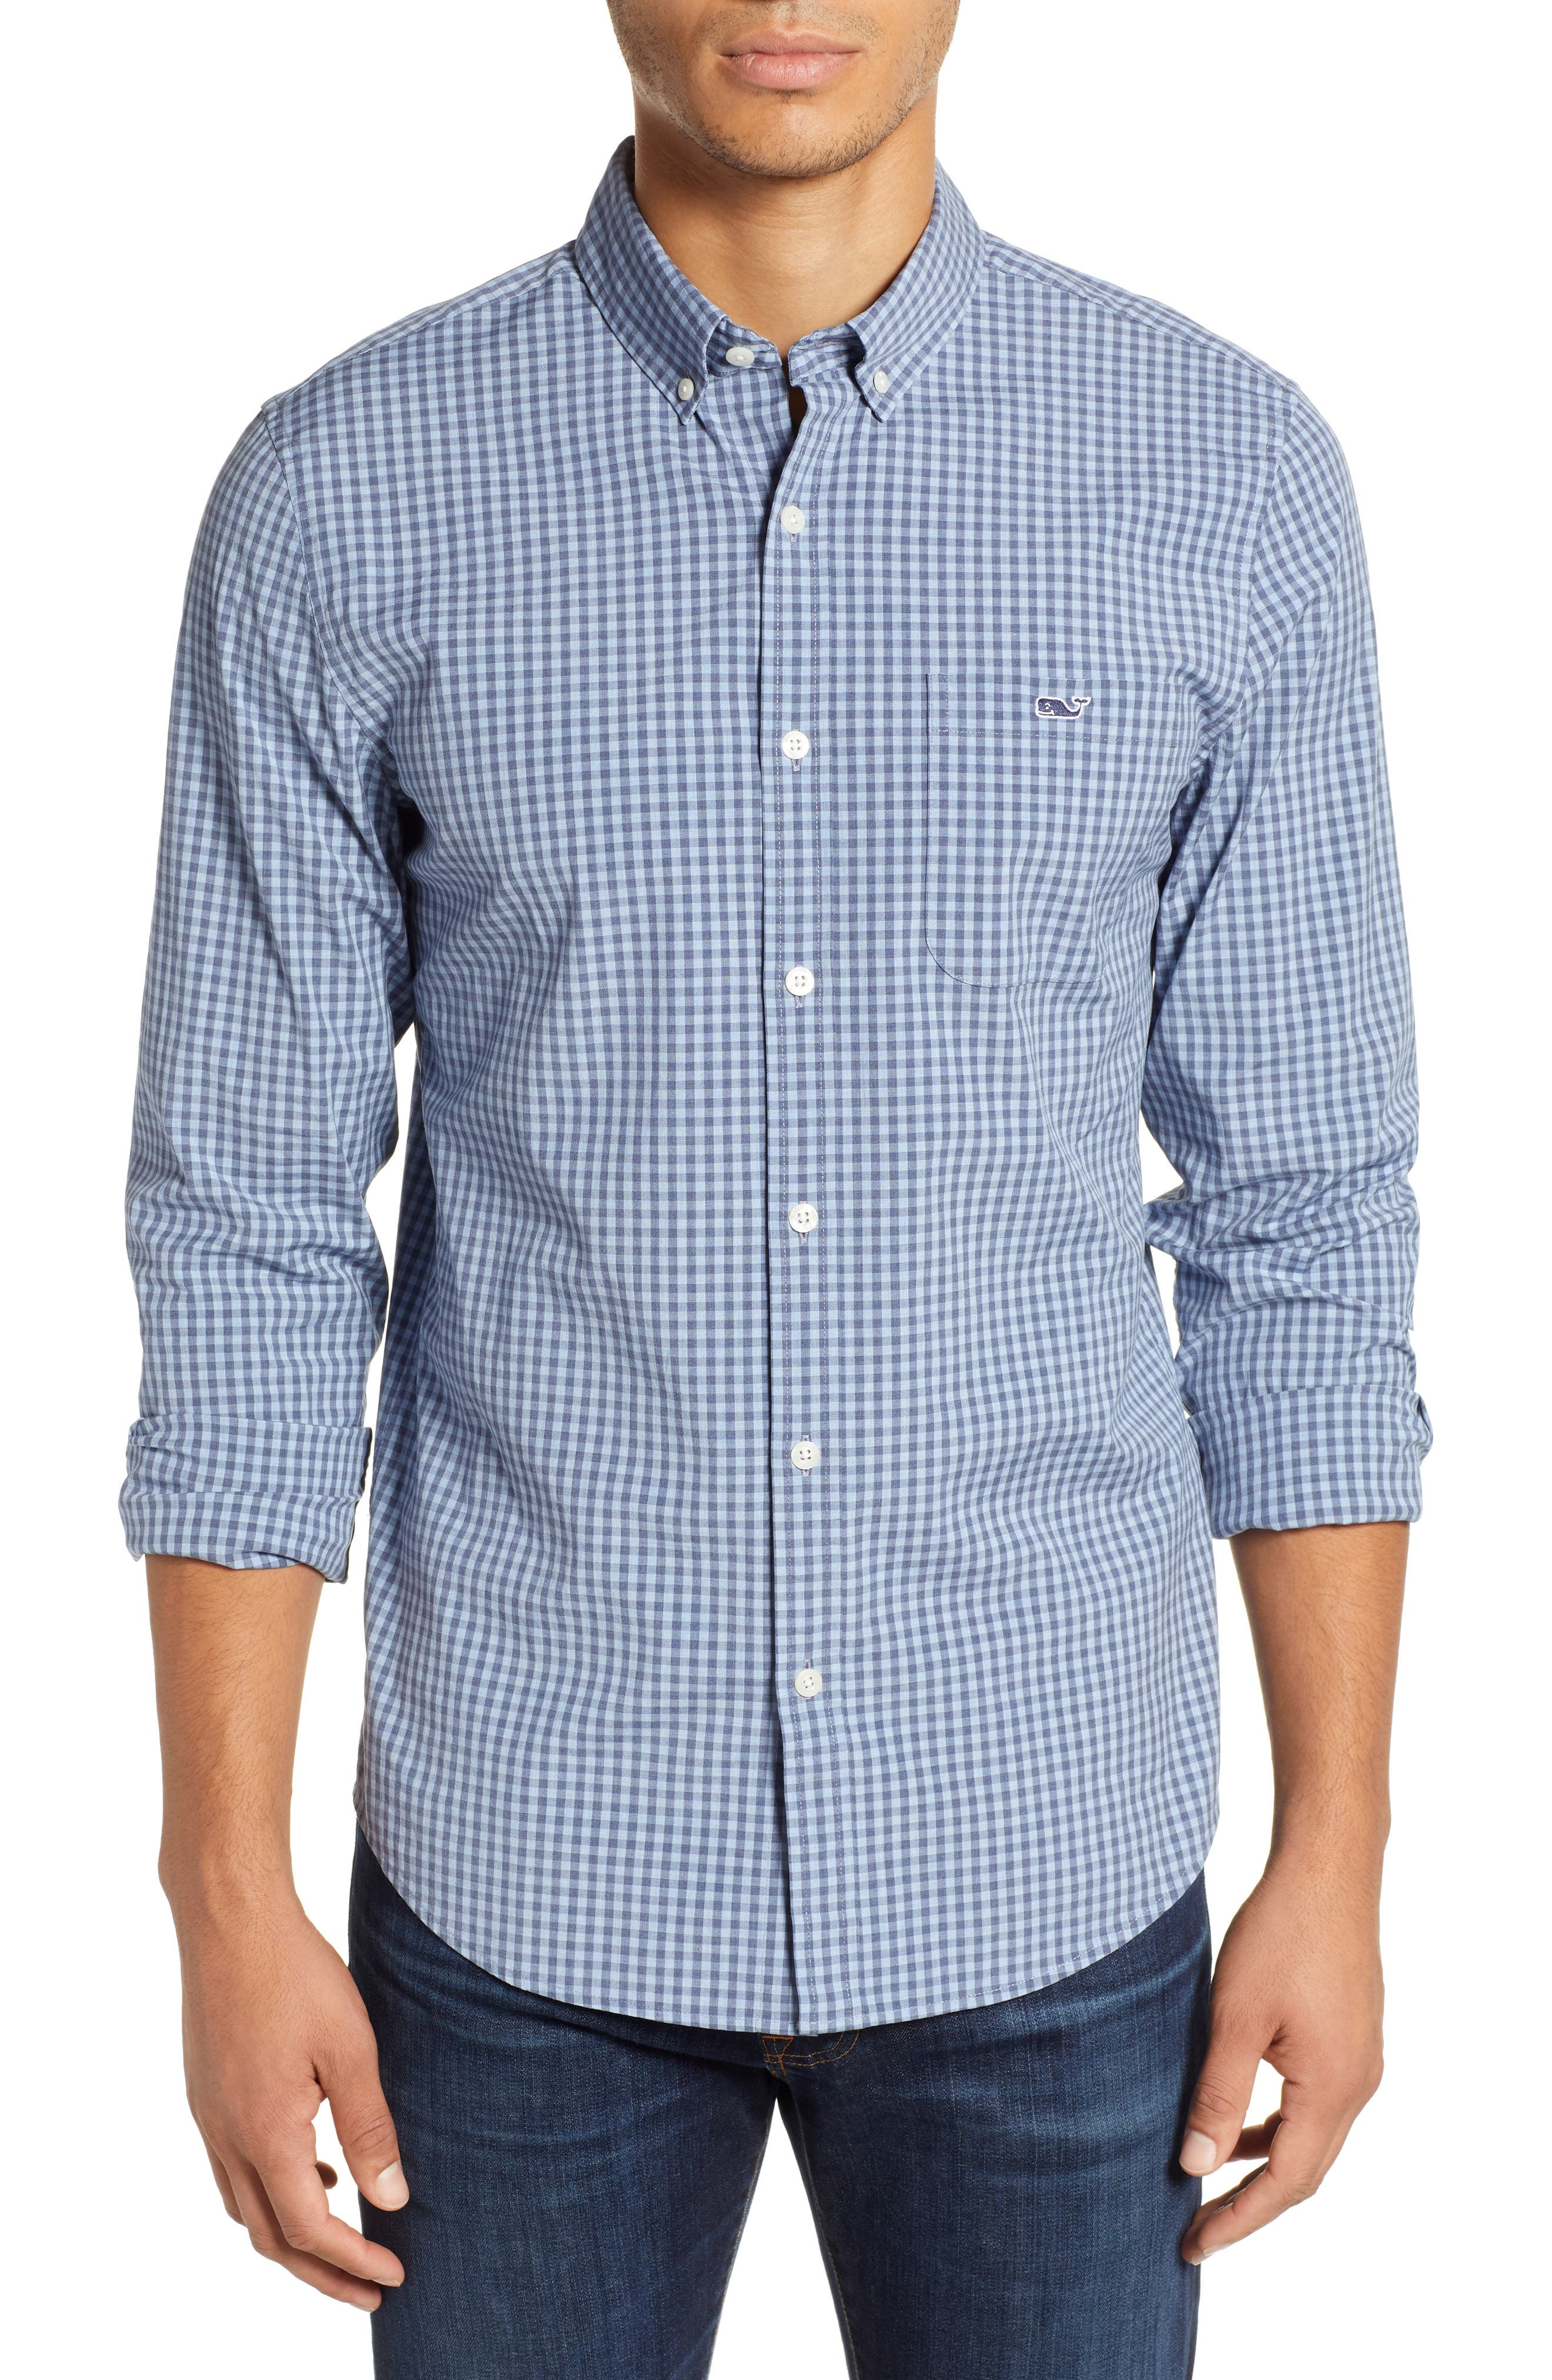 Tucker Gingham Slim Fit Button-Down Shirt in Coastline